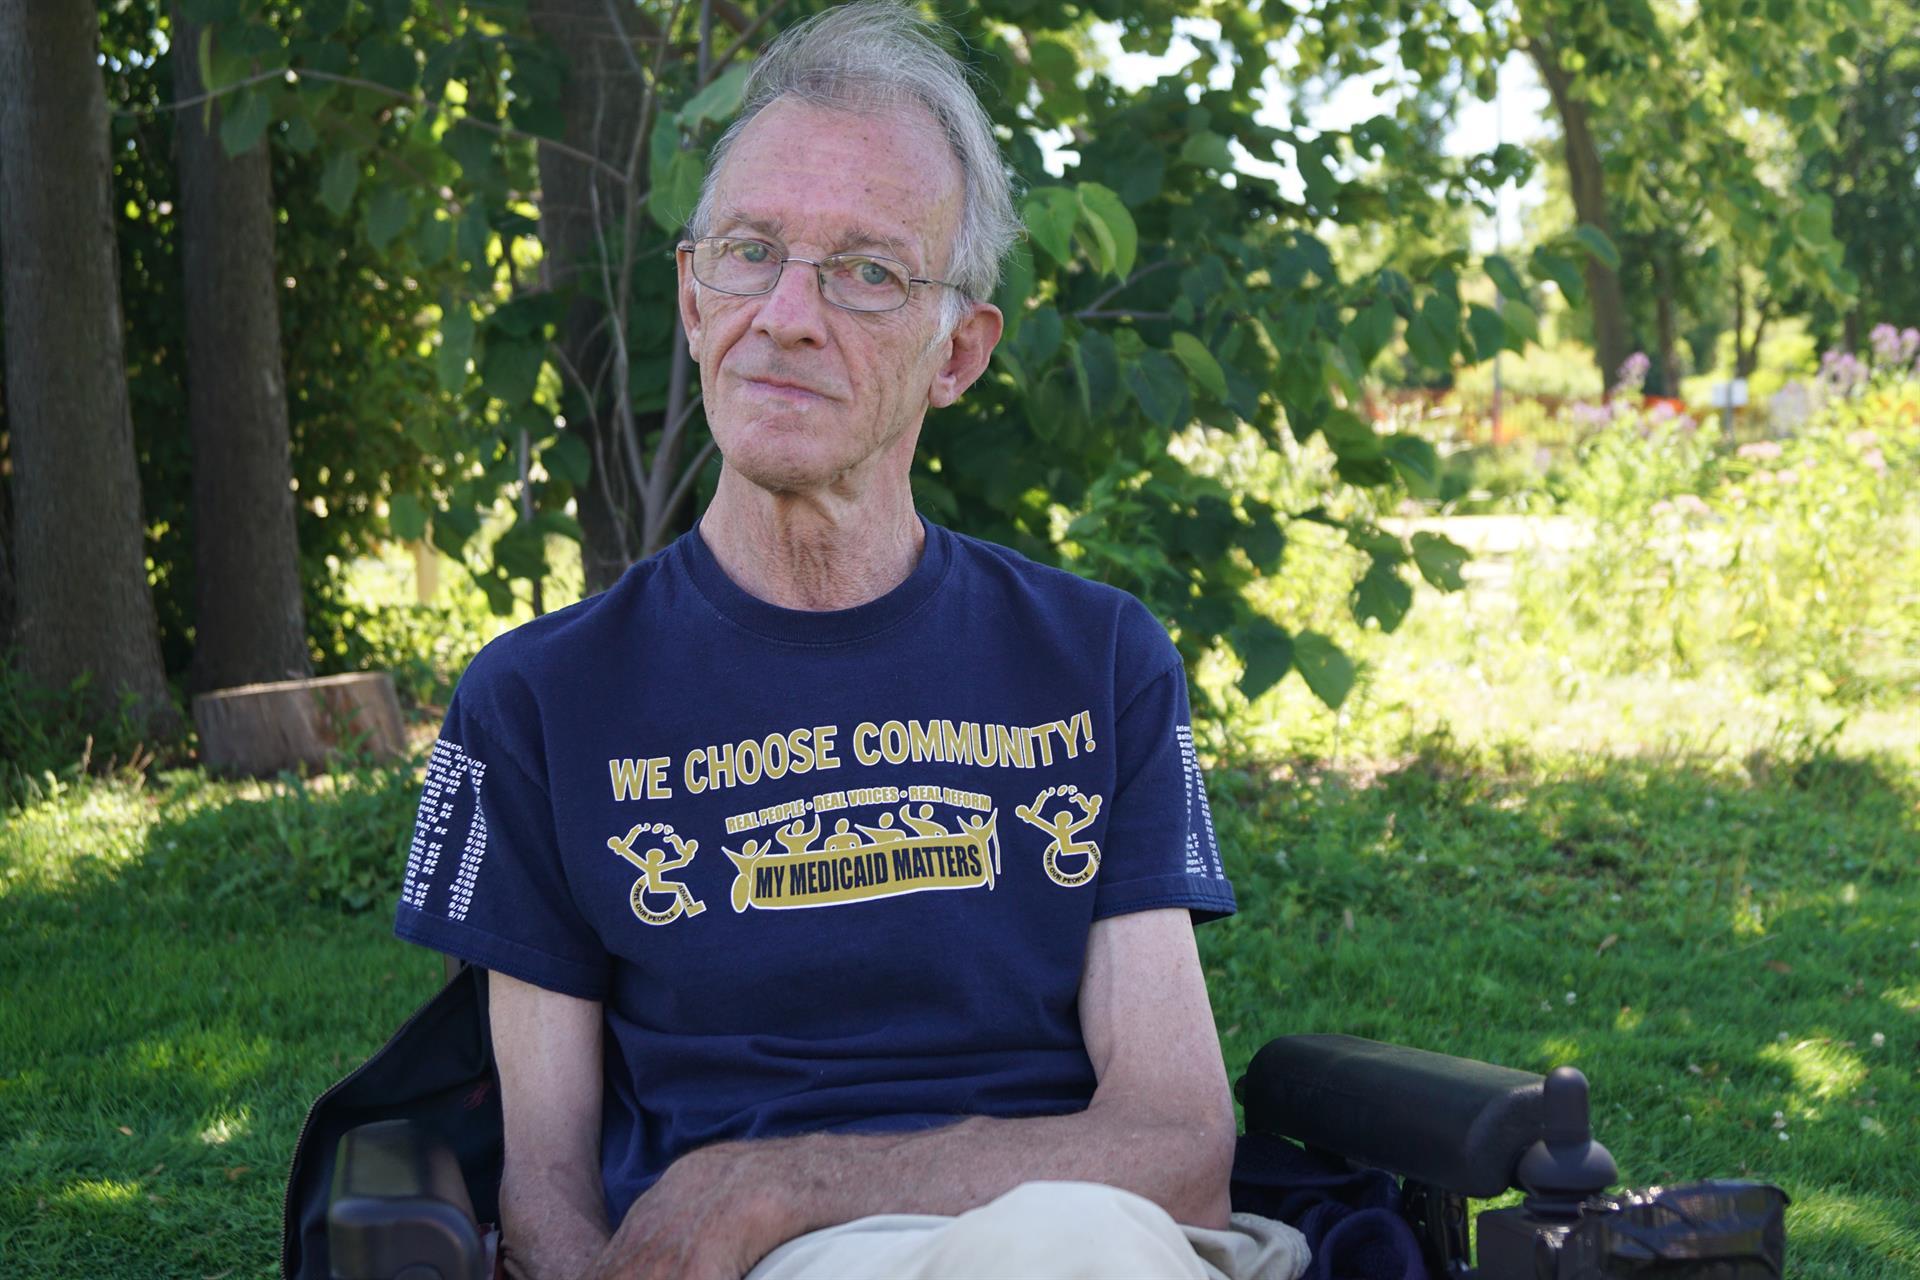 Elderly disabled man wearing a